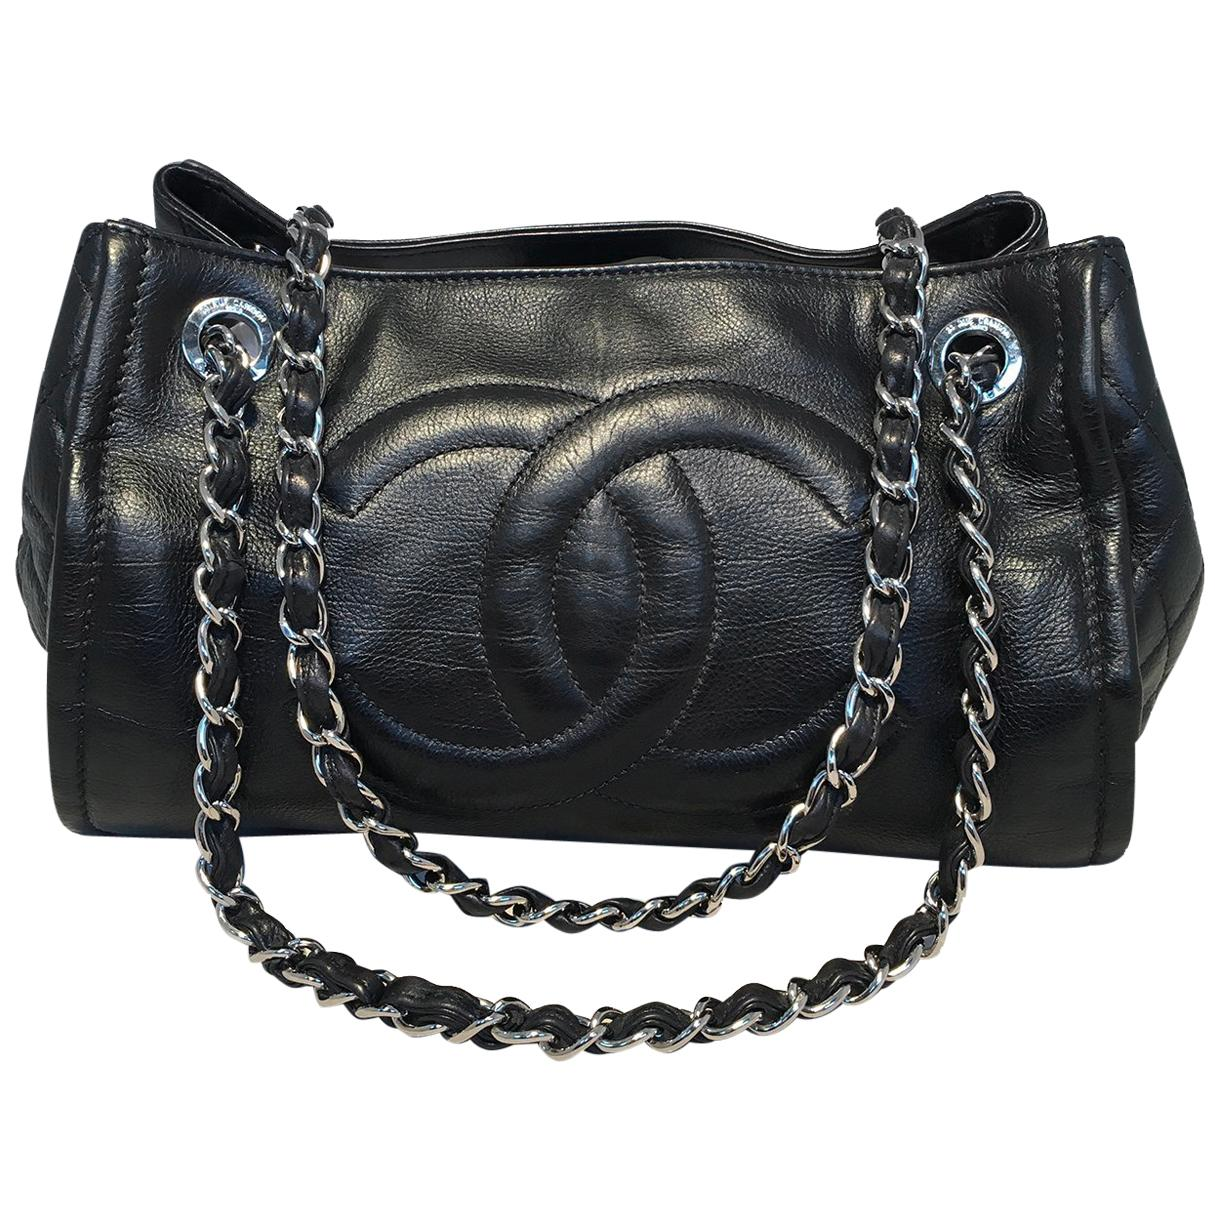 18a036c54e65 Vintage and Designer Bags - 24